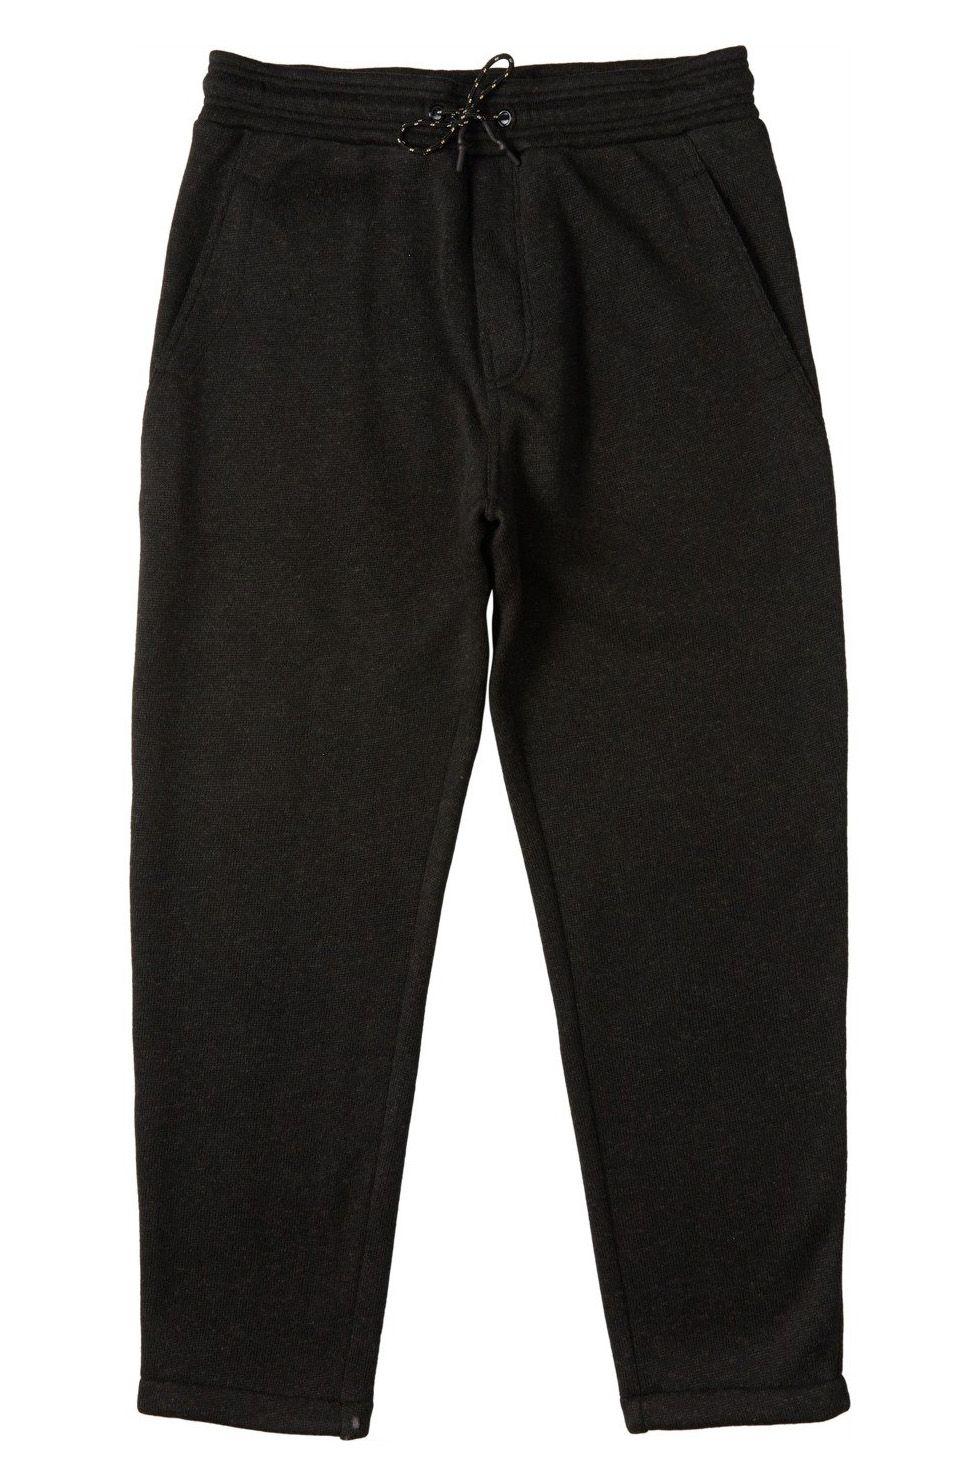 Billabong Pants BOUNDARY PANT ADVENTURE DIVISION Black